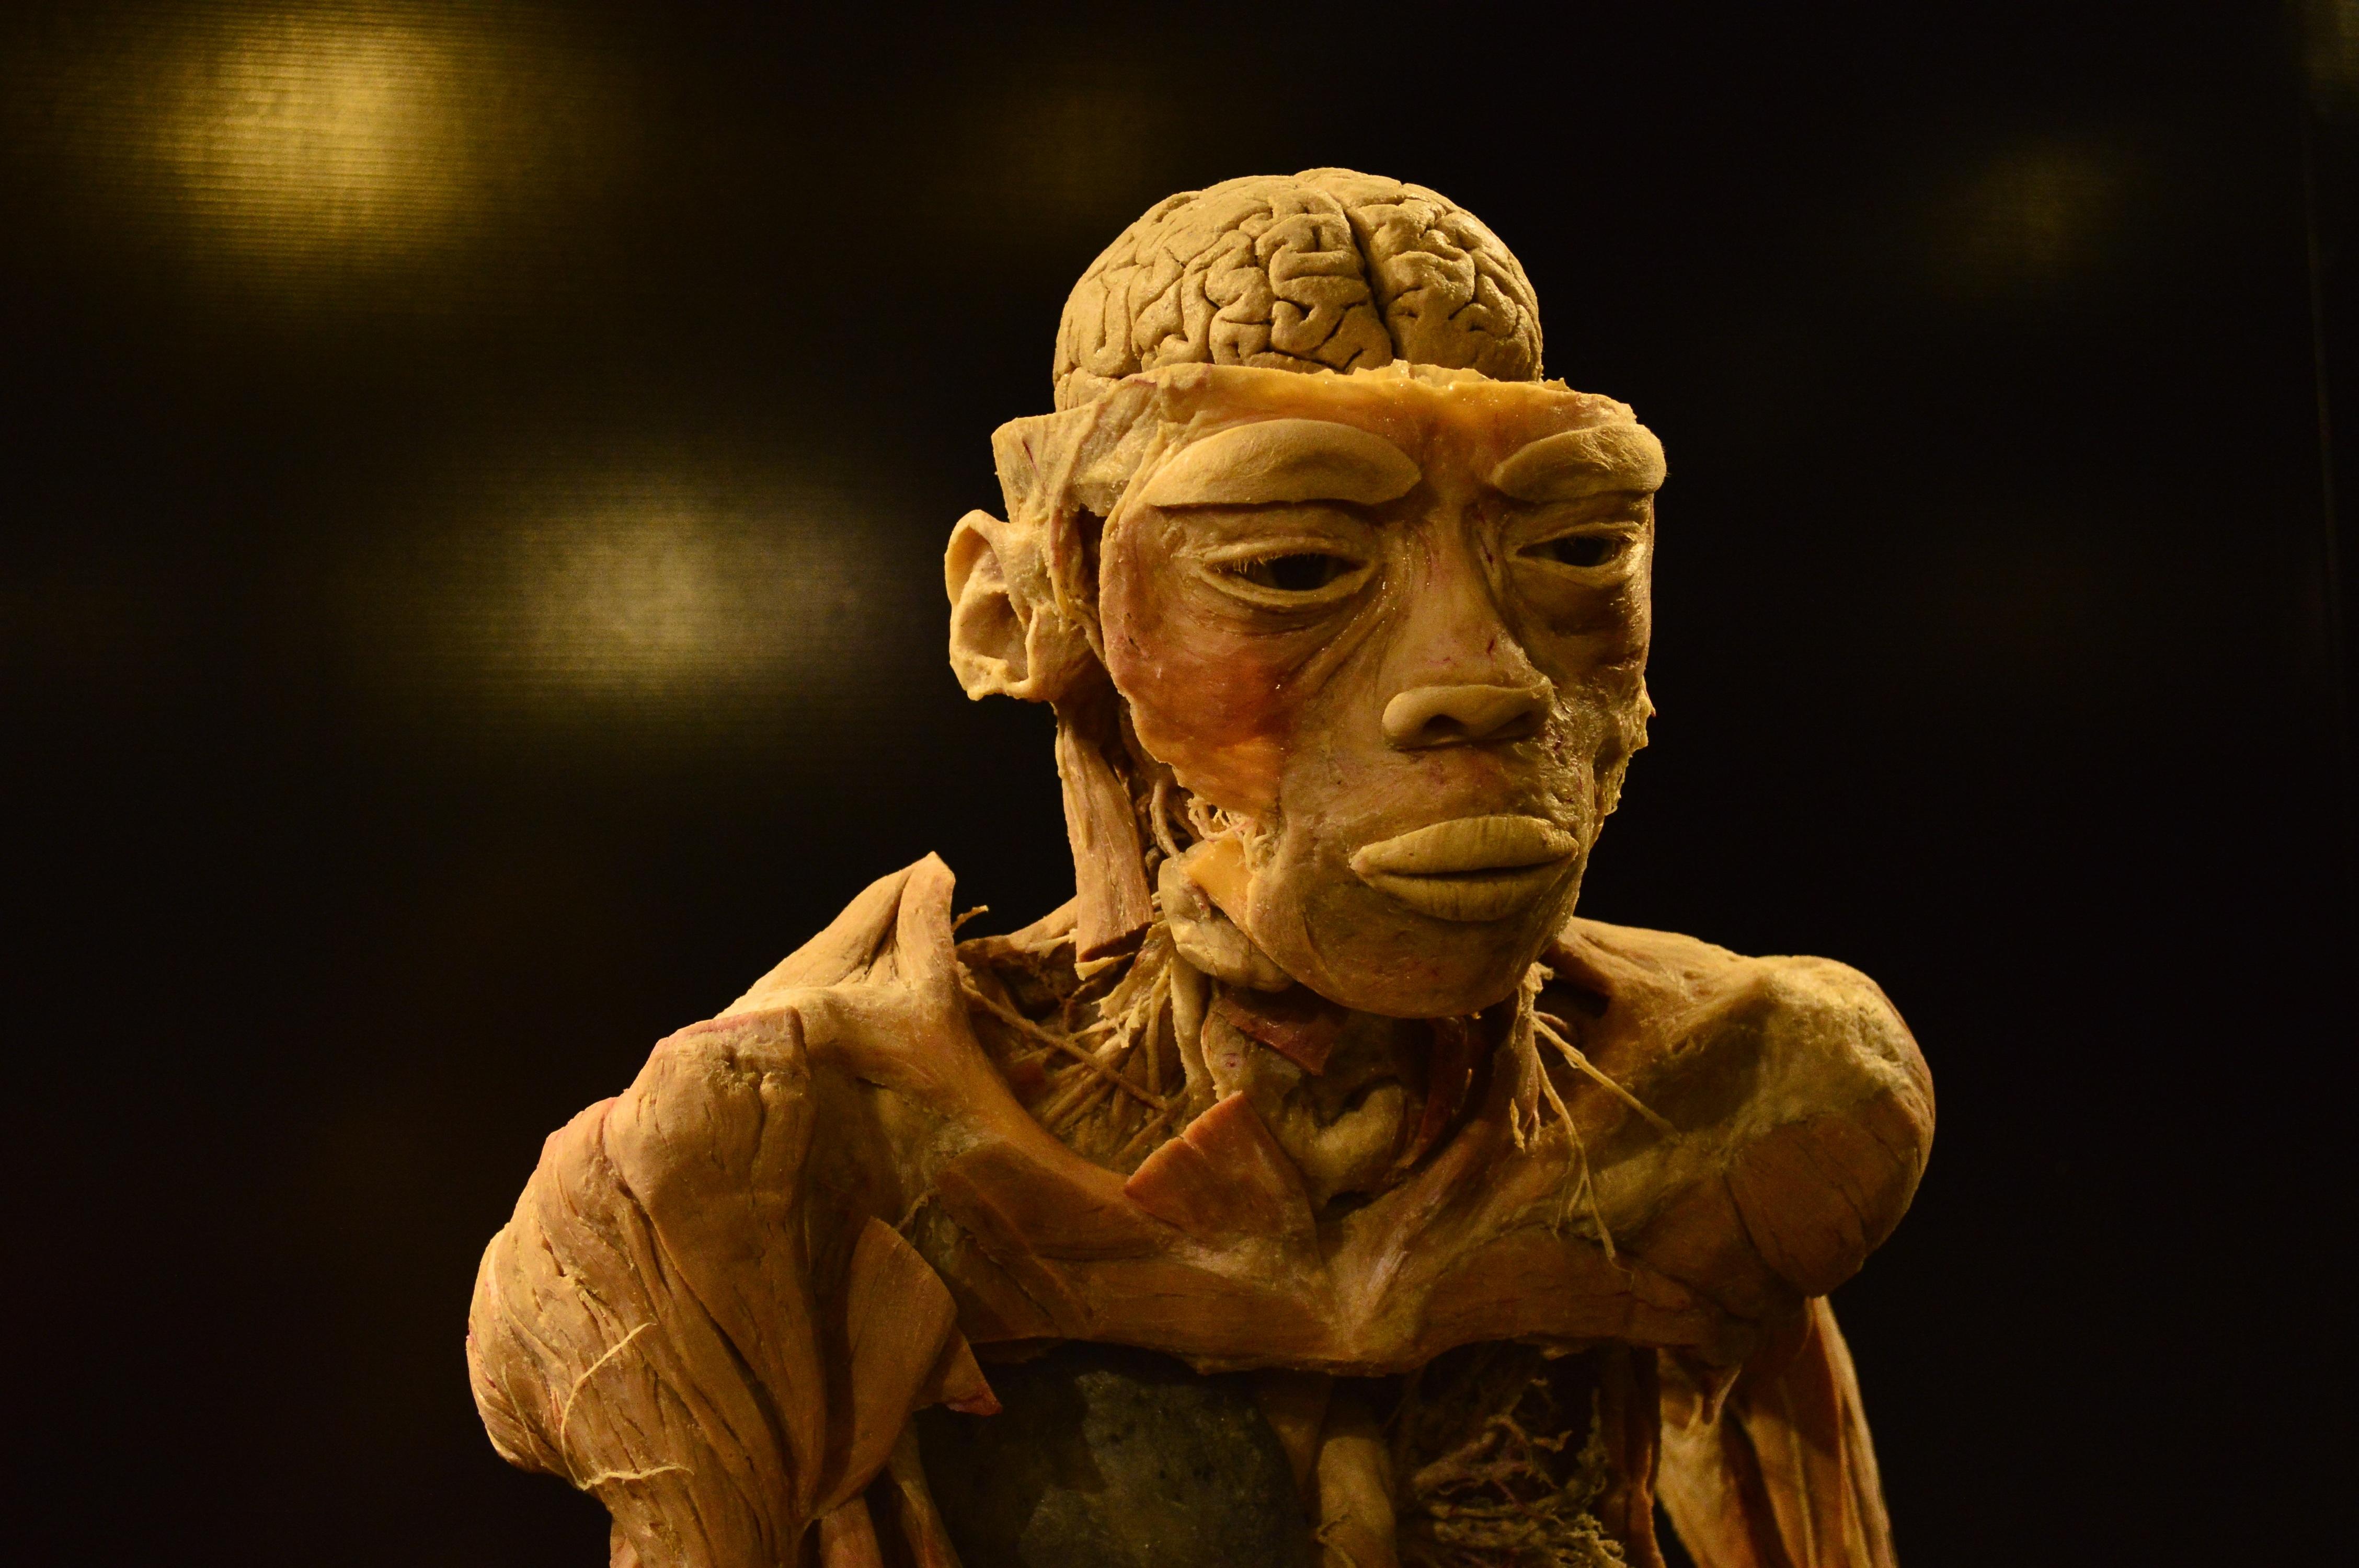 Fotos gratis : Monumento, estatua, cuerpo humano, escultura, art ...